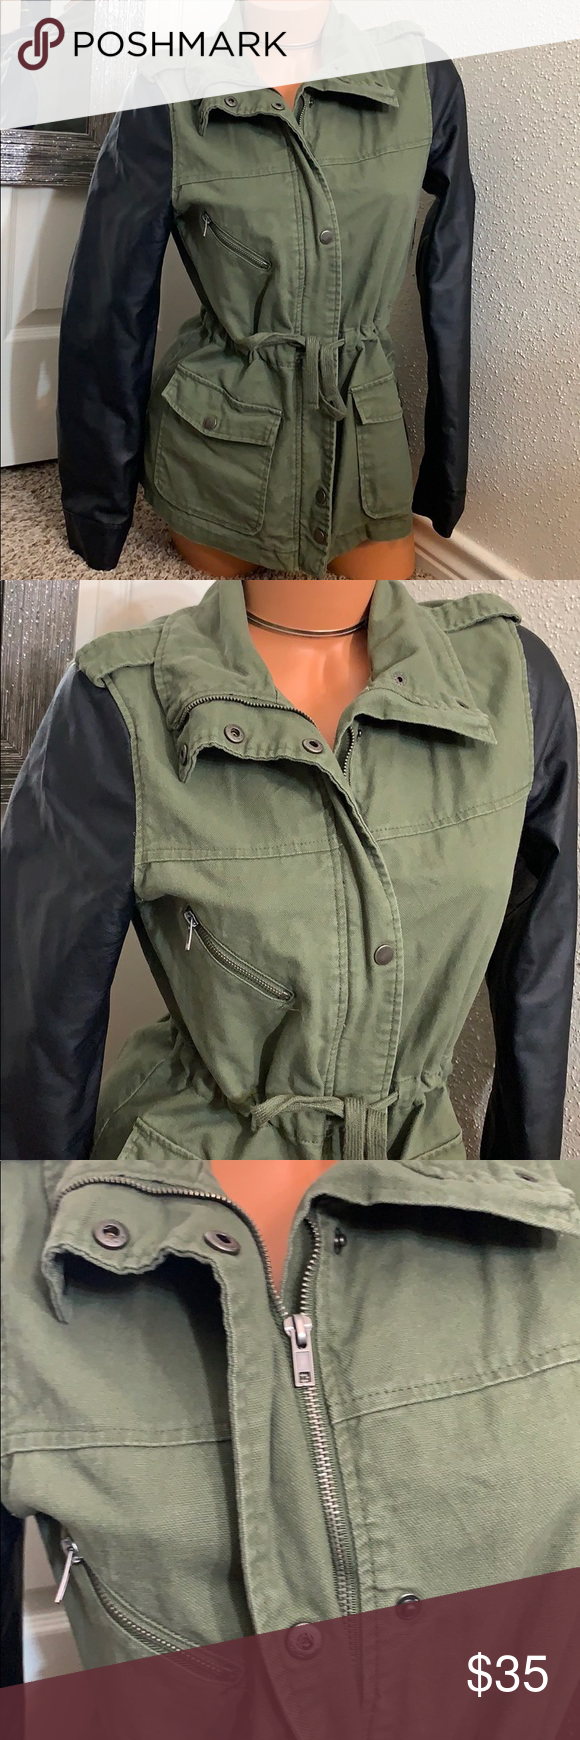 Utility Jacket Faux Leather Army Style Jacket Army Fashion Clothes Design Fashion [ 1740 x 580 Pixel ]